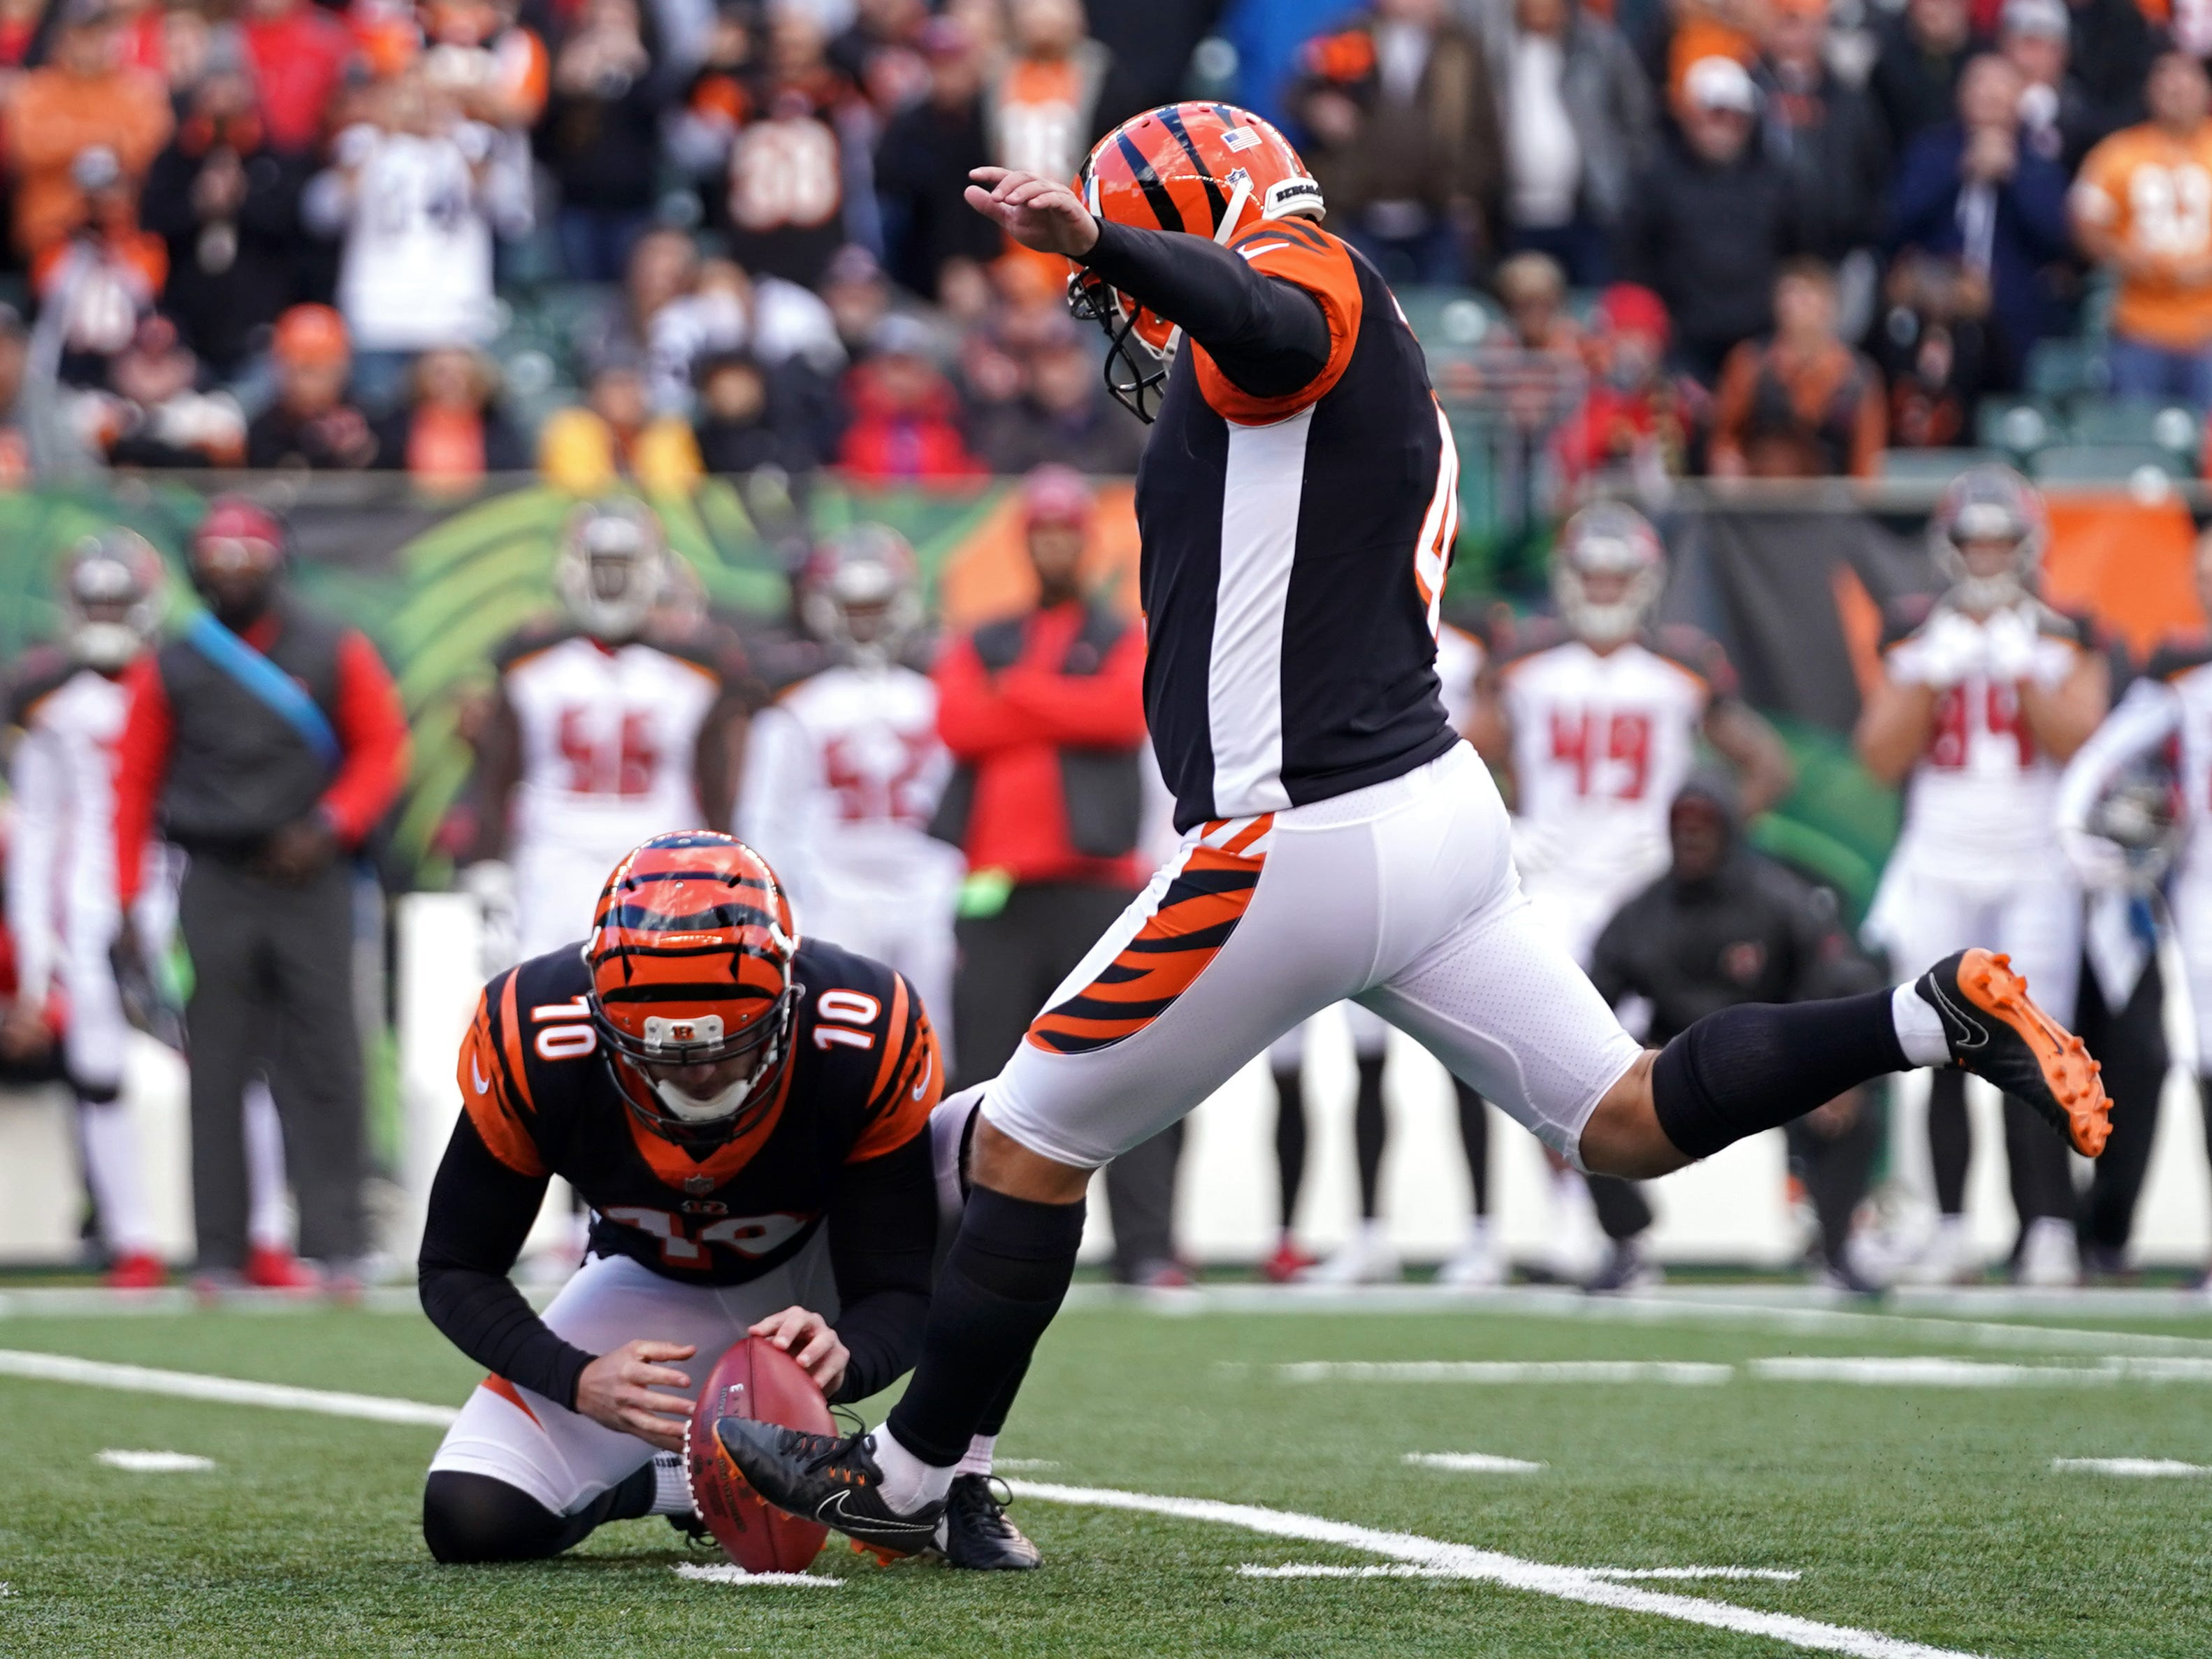 Randy Bullock (4) kicks the game- winning field goal to lead the Cincinnati Bengals past the Tampa Bay Buccaneers at Paul Brown Stadium.